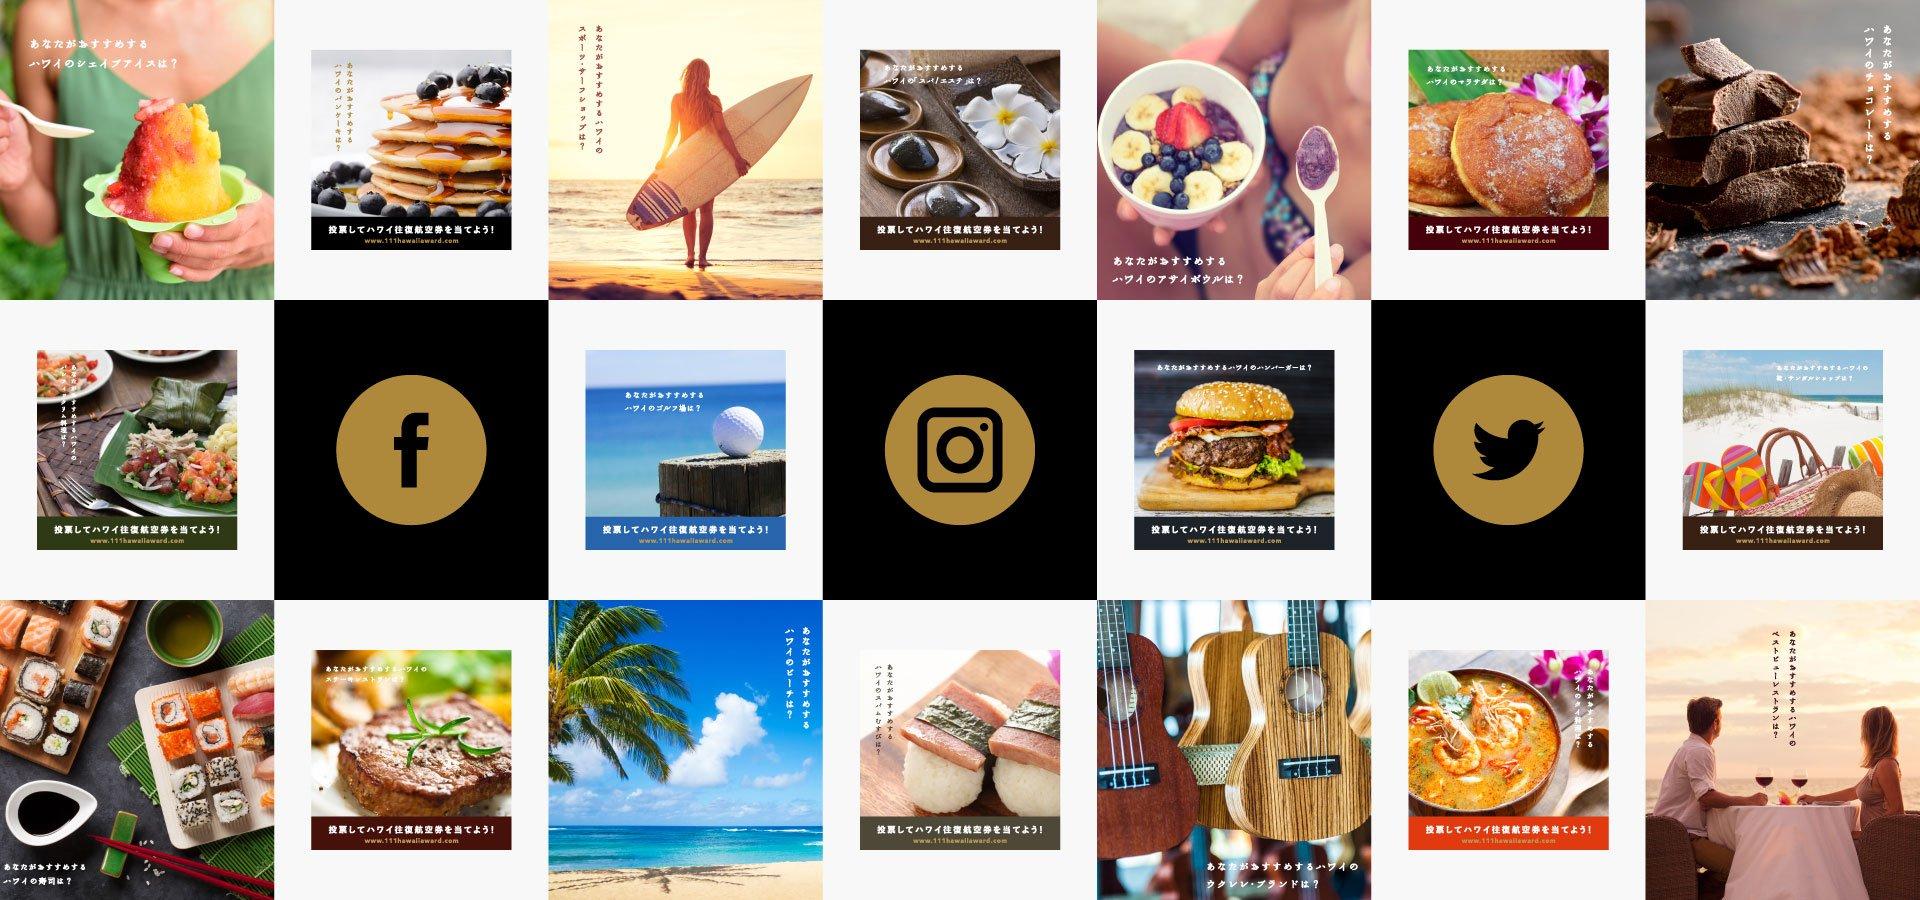 111-Hawaii Award Social Media Graphics